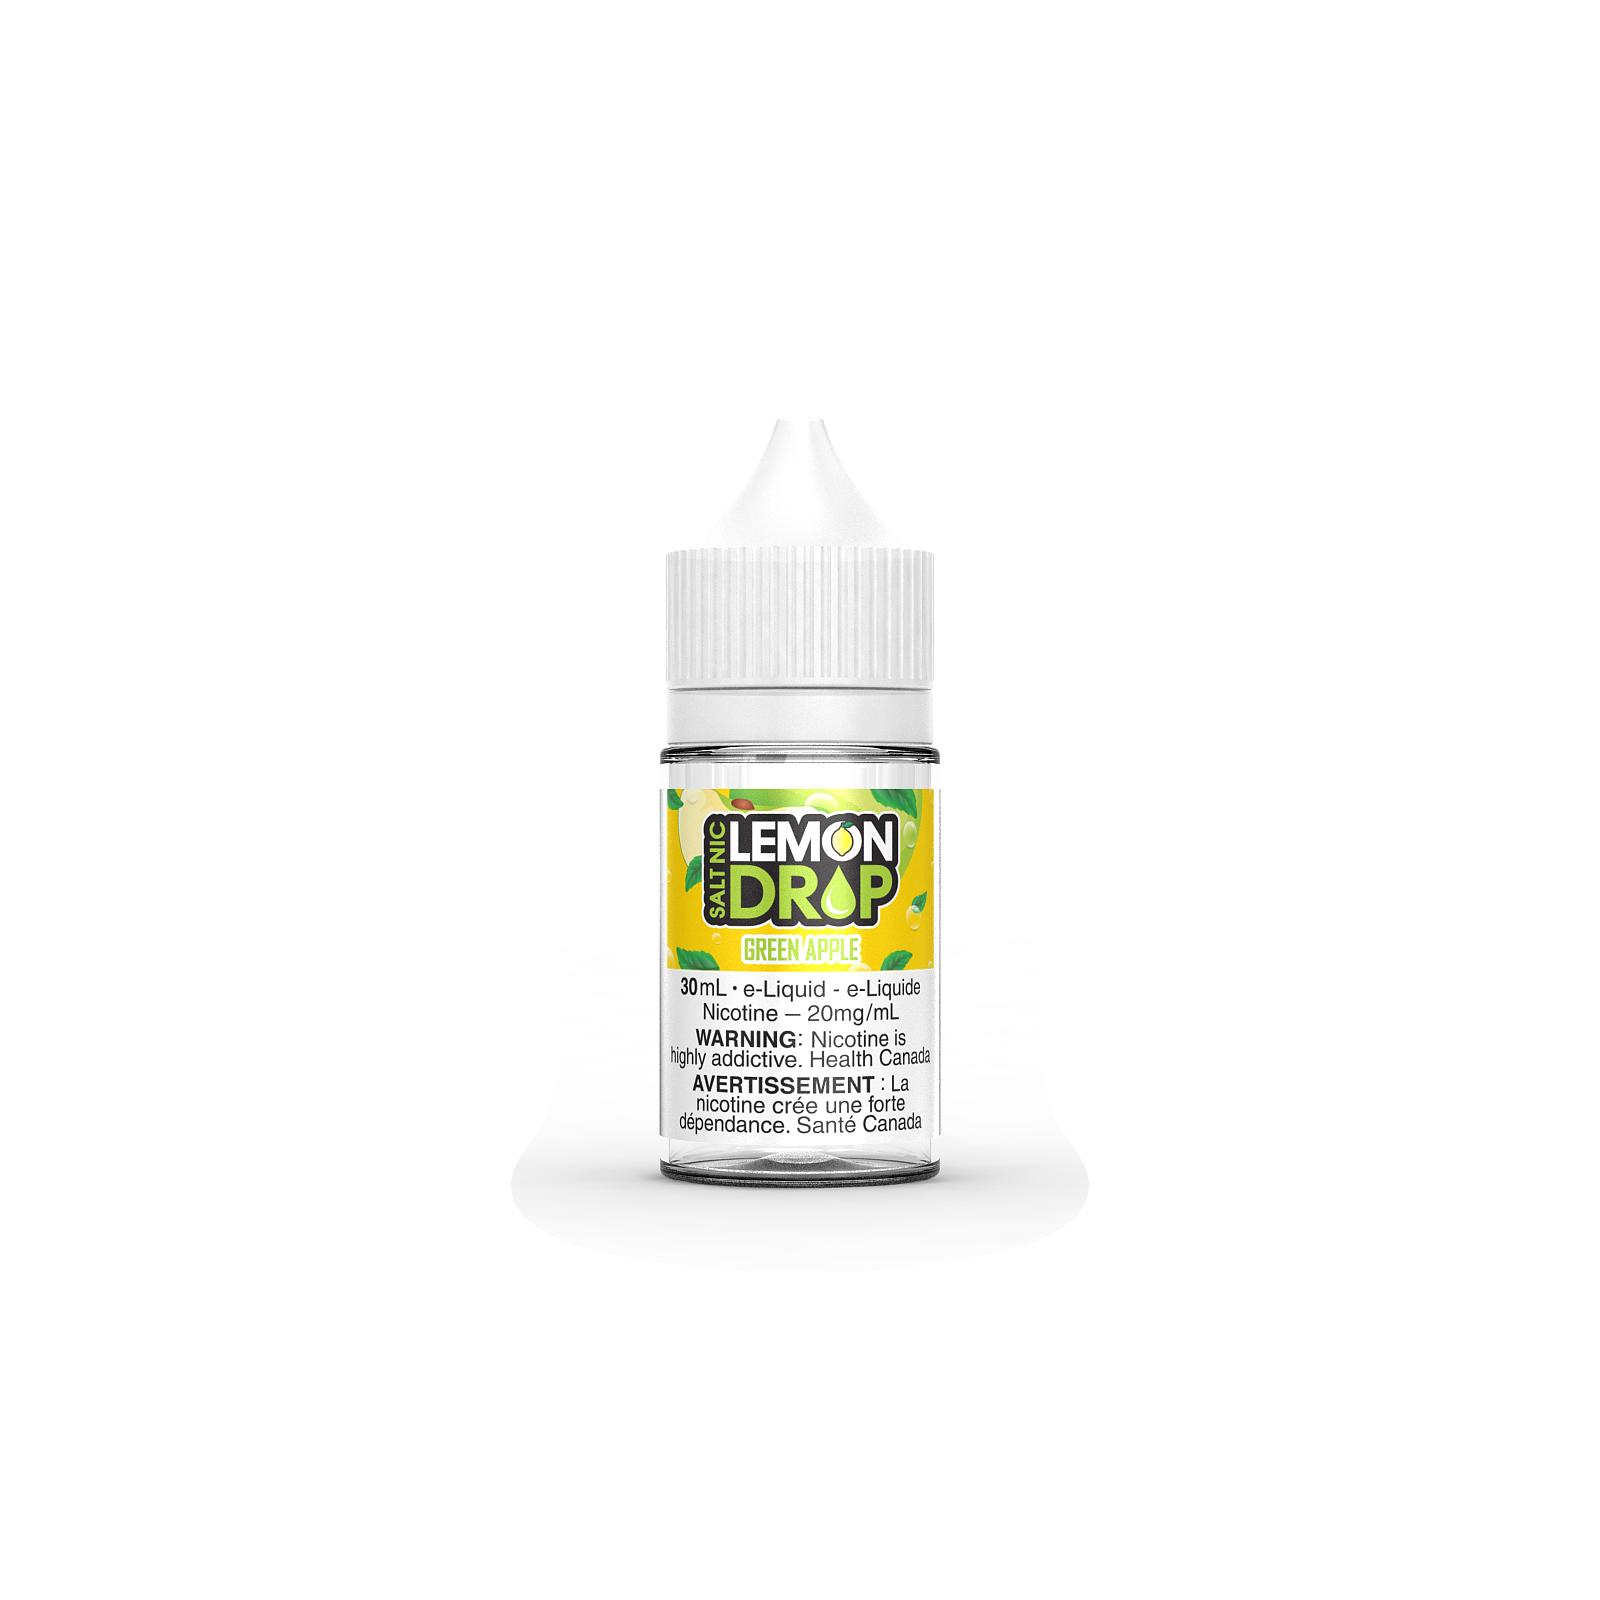 Lemon Drop Salt_Green Apple_01